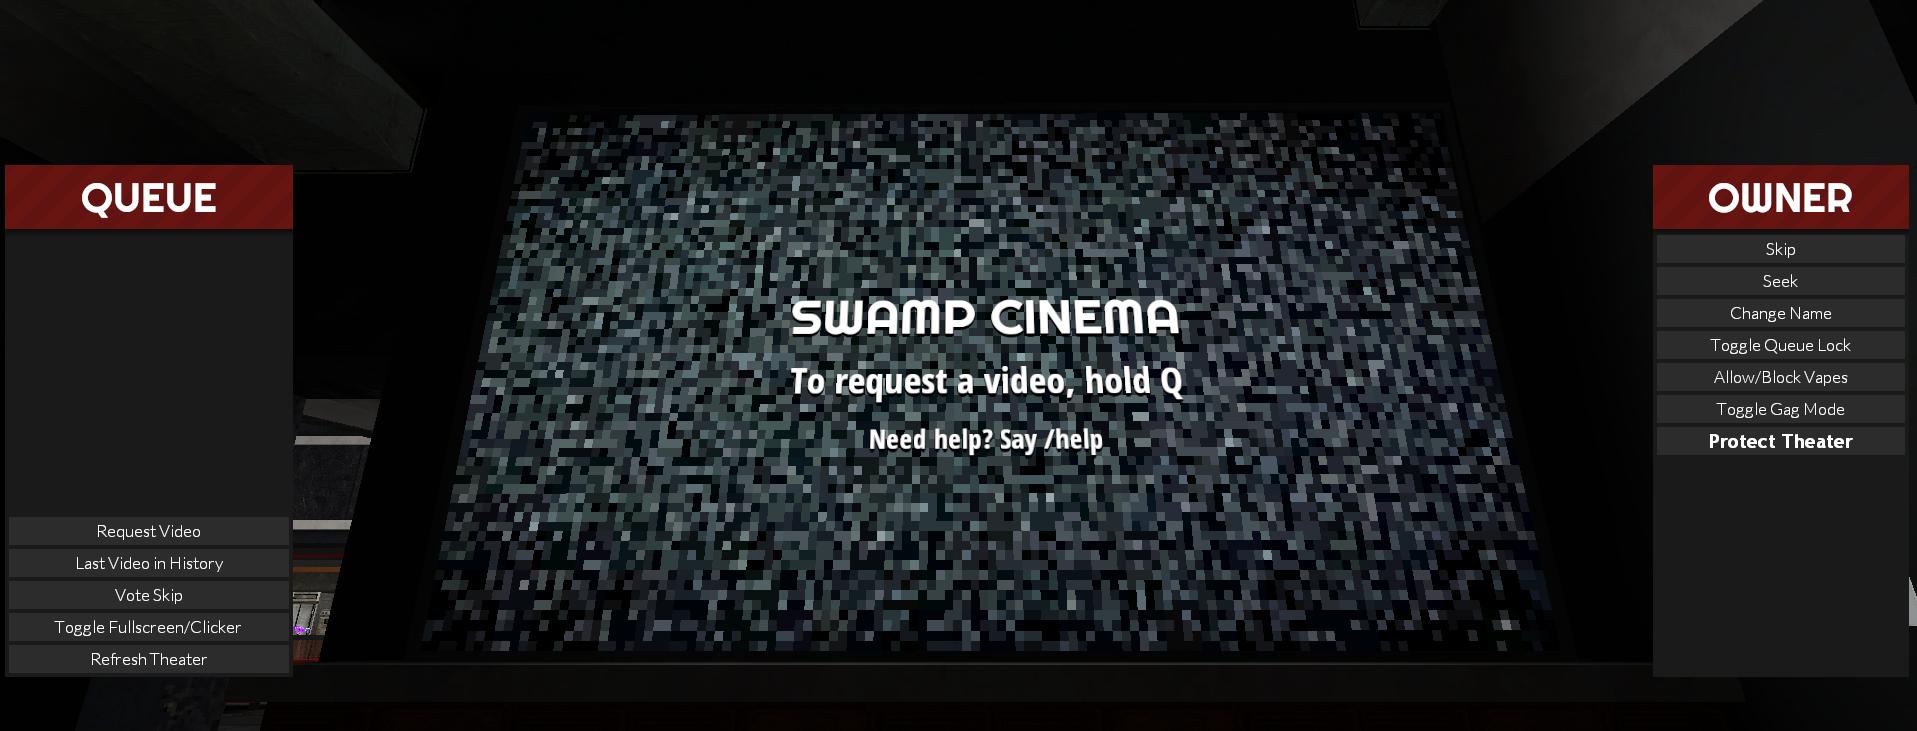 Garry's Mod Server Swamp Cinema + Map + Locations - Overview - Cinema: - 3ACF697